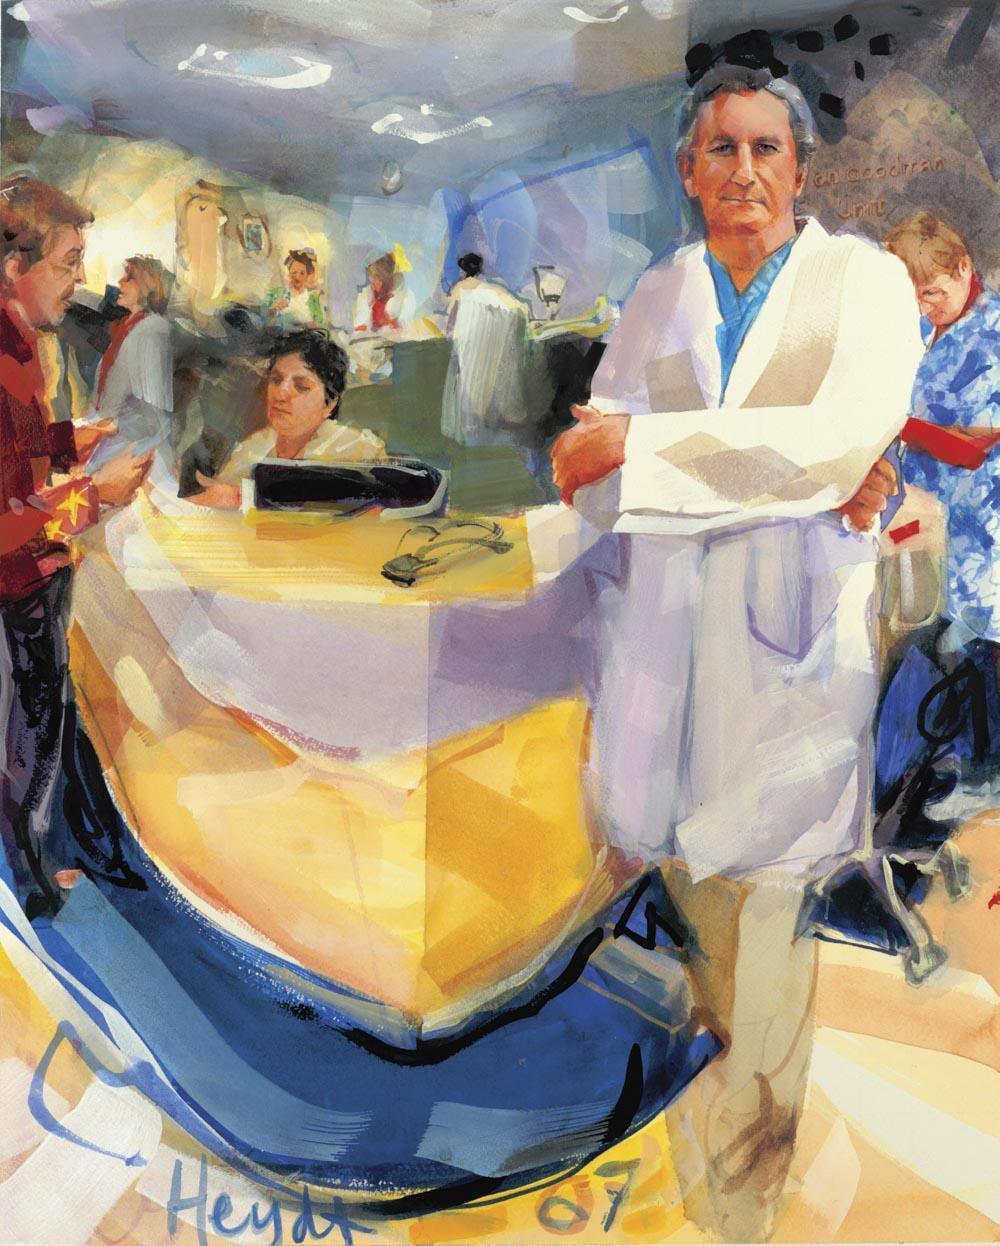 Doctor Orest Zaklynsky M.D., Surgeon, Newport Hospital